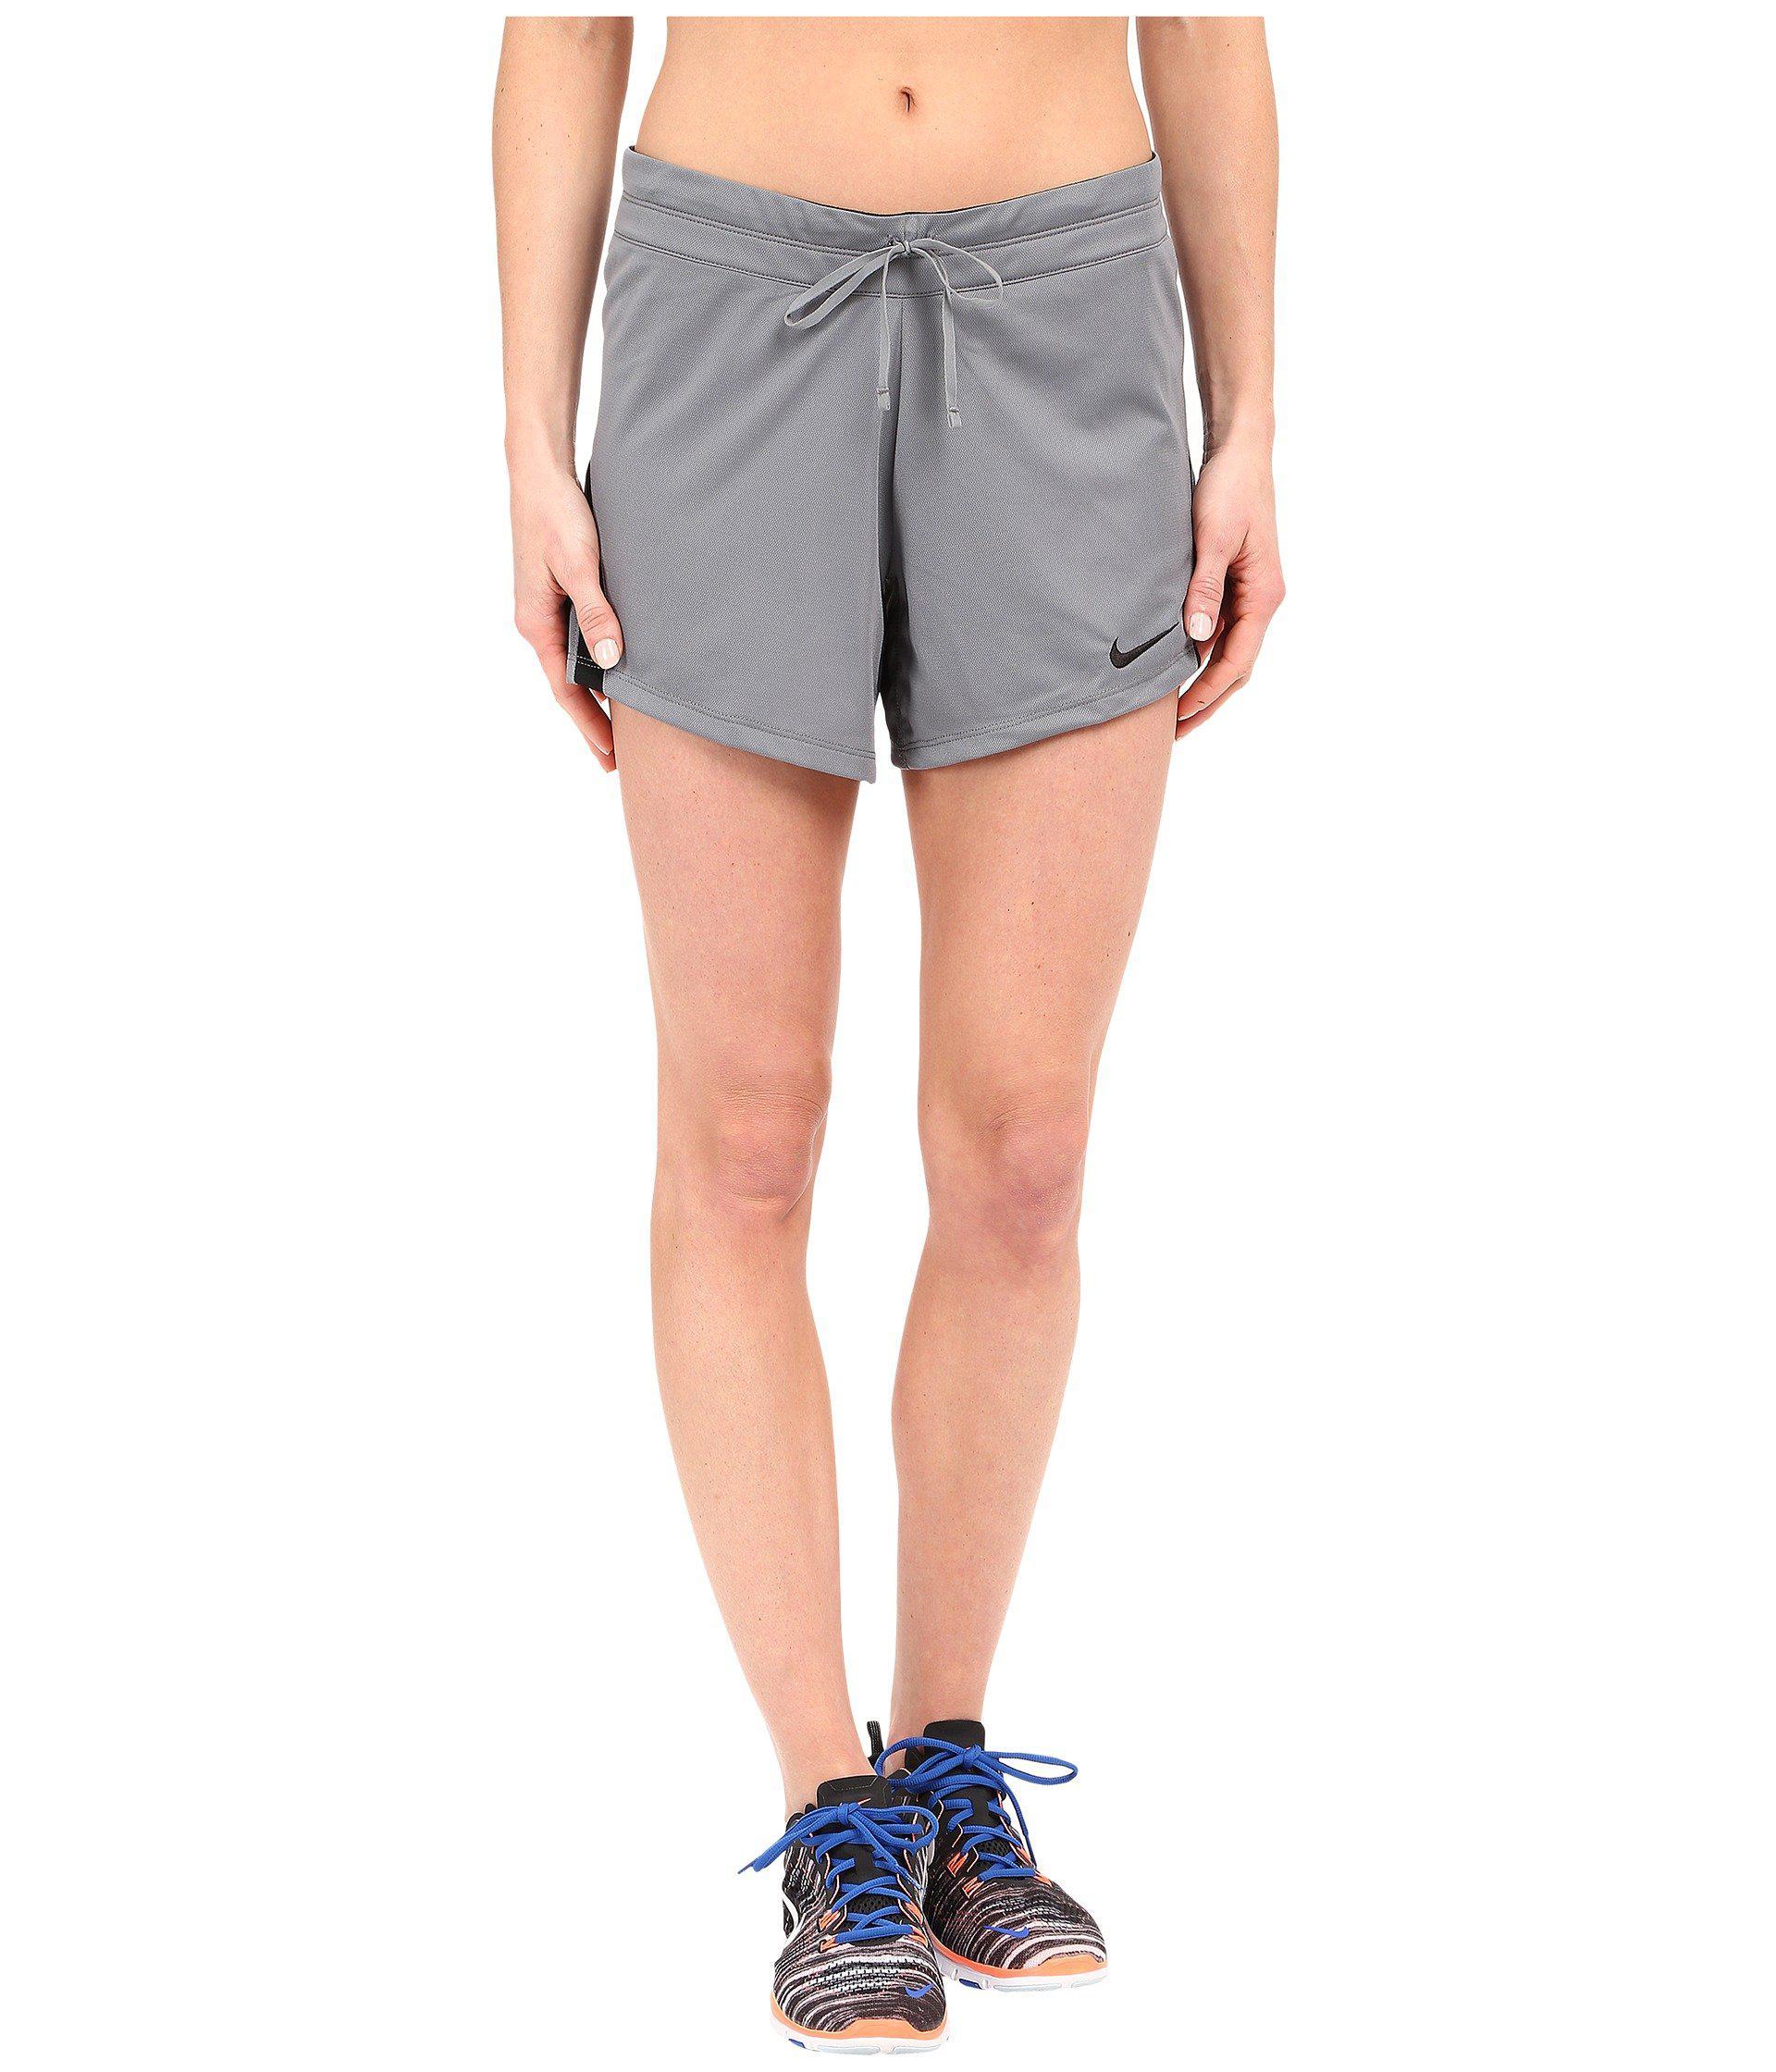 Nike. Women's Black Infiknit Mid Shorts